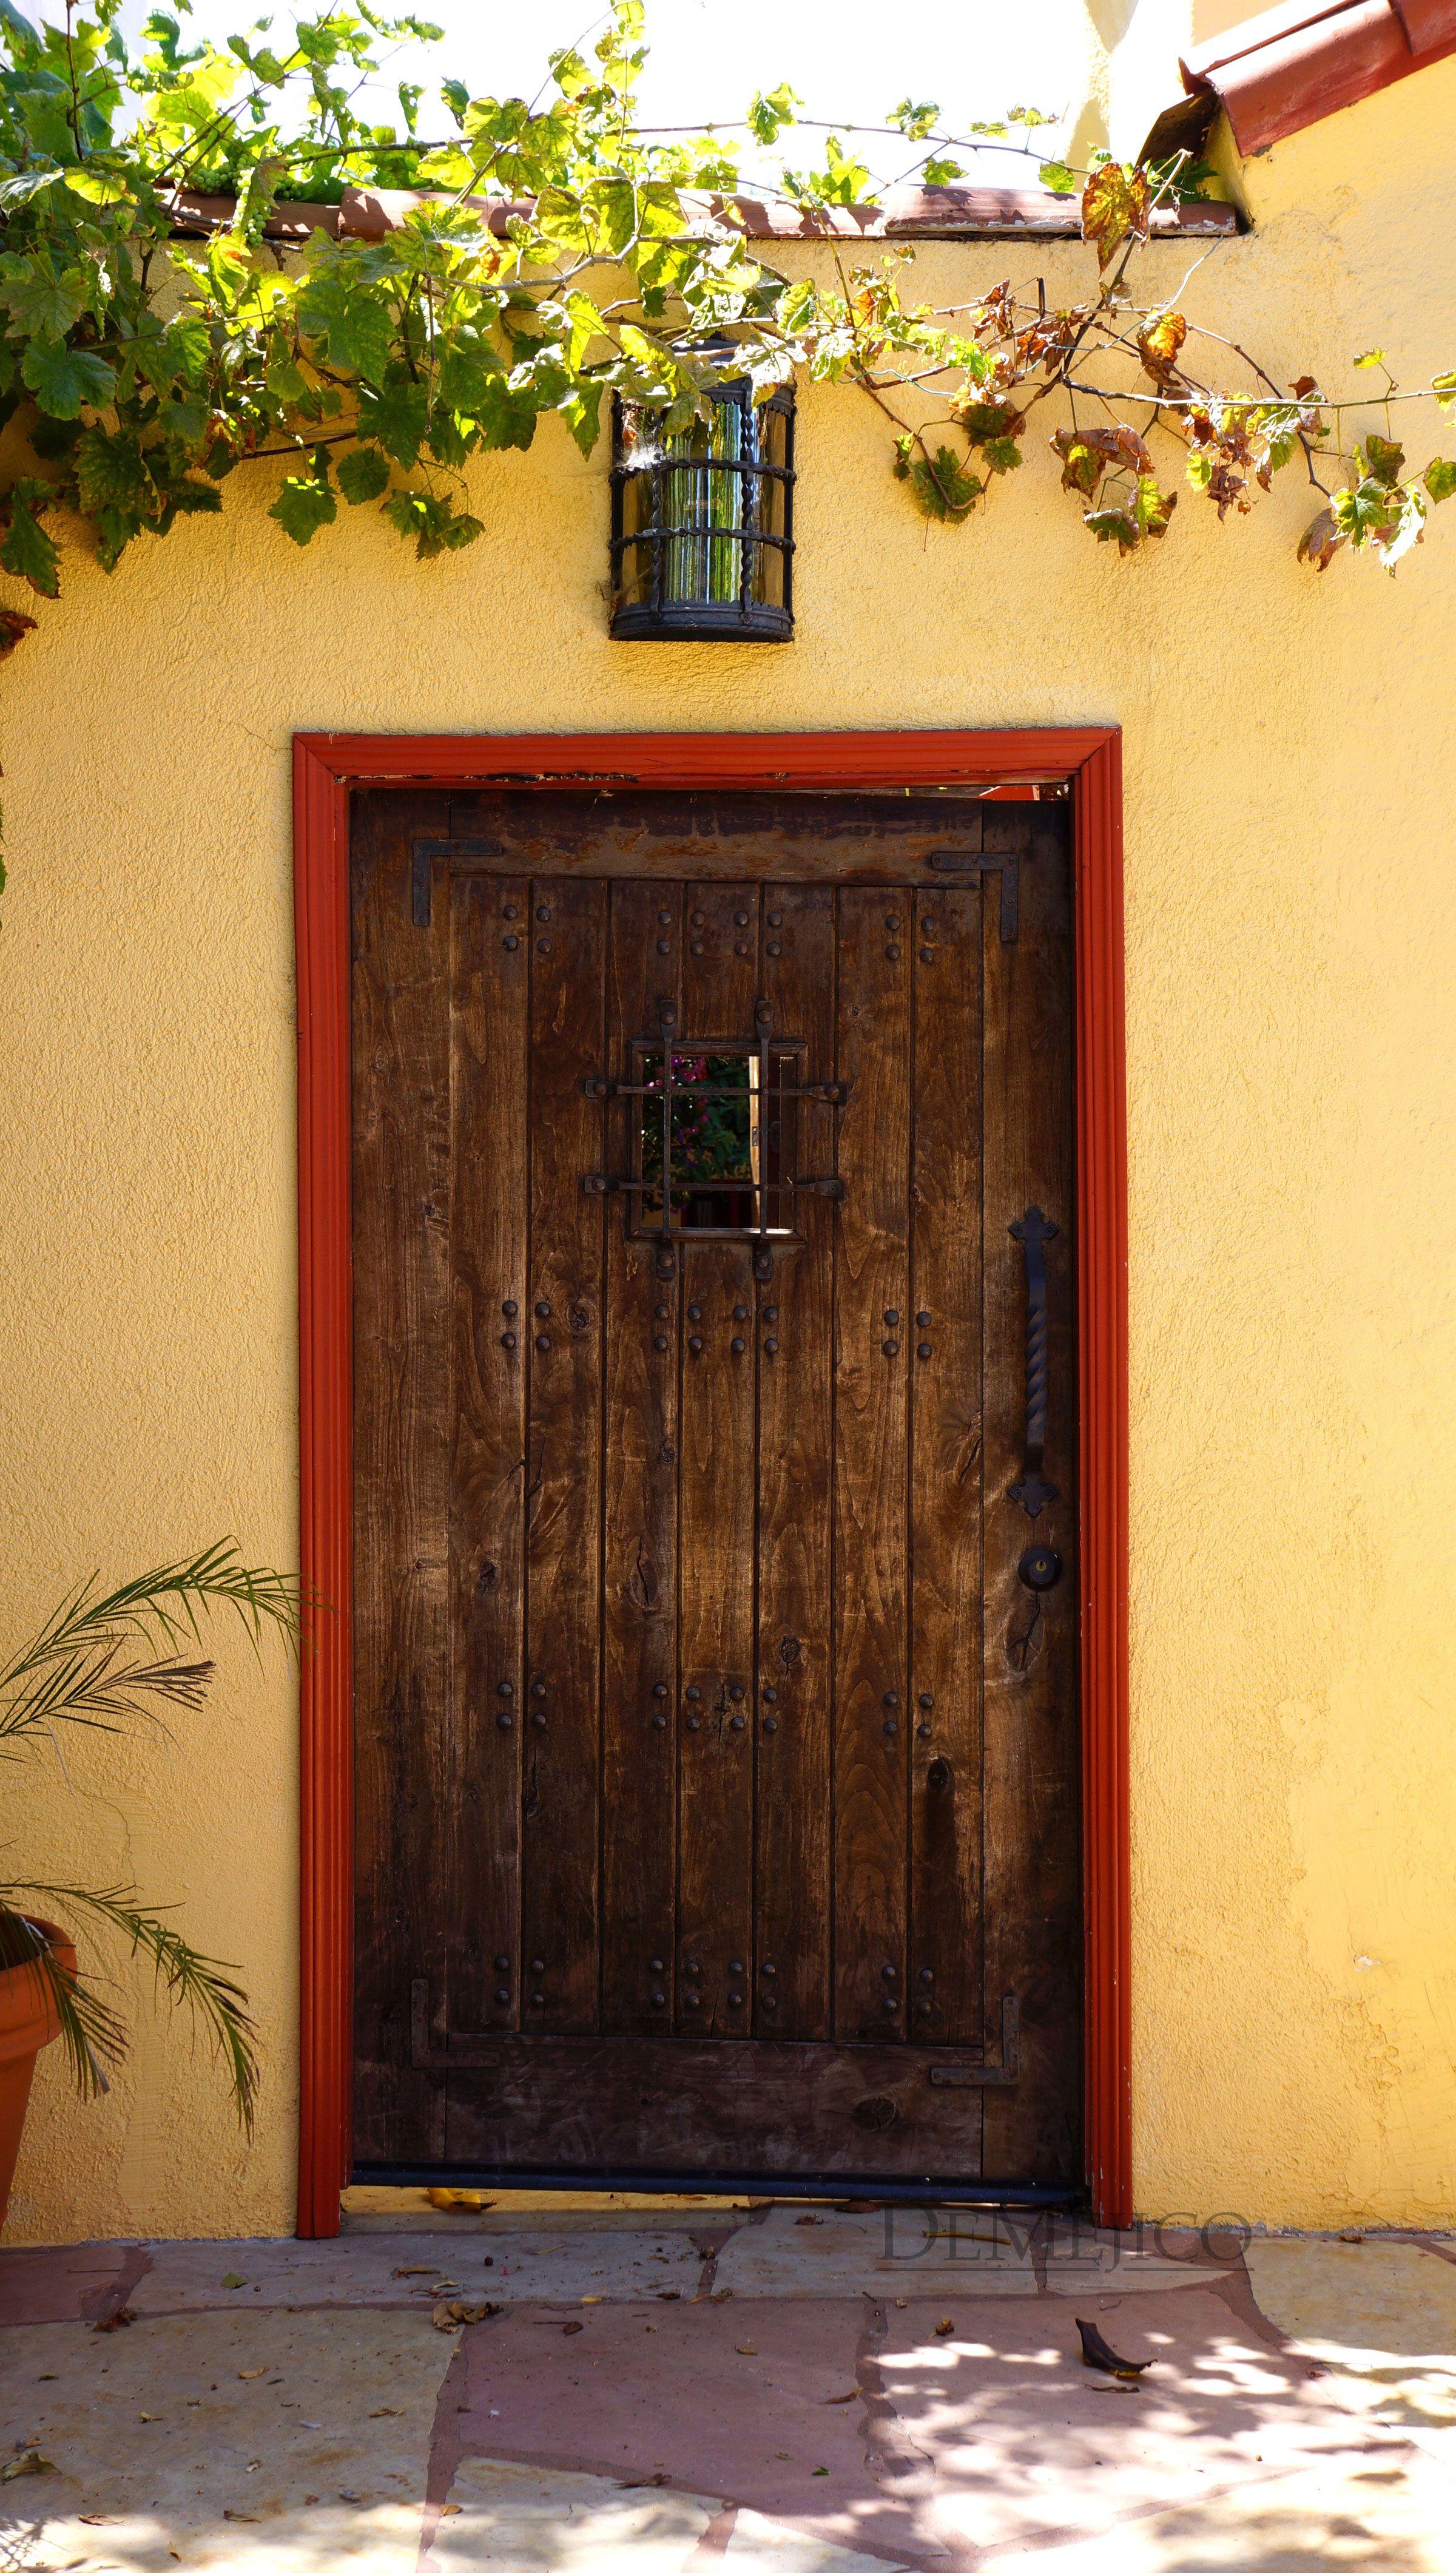 Gorgeous Spanish Gate Luscious Green Vines Bright Yellow Wall